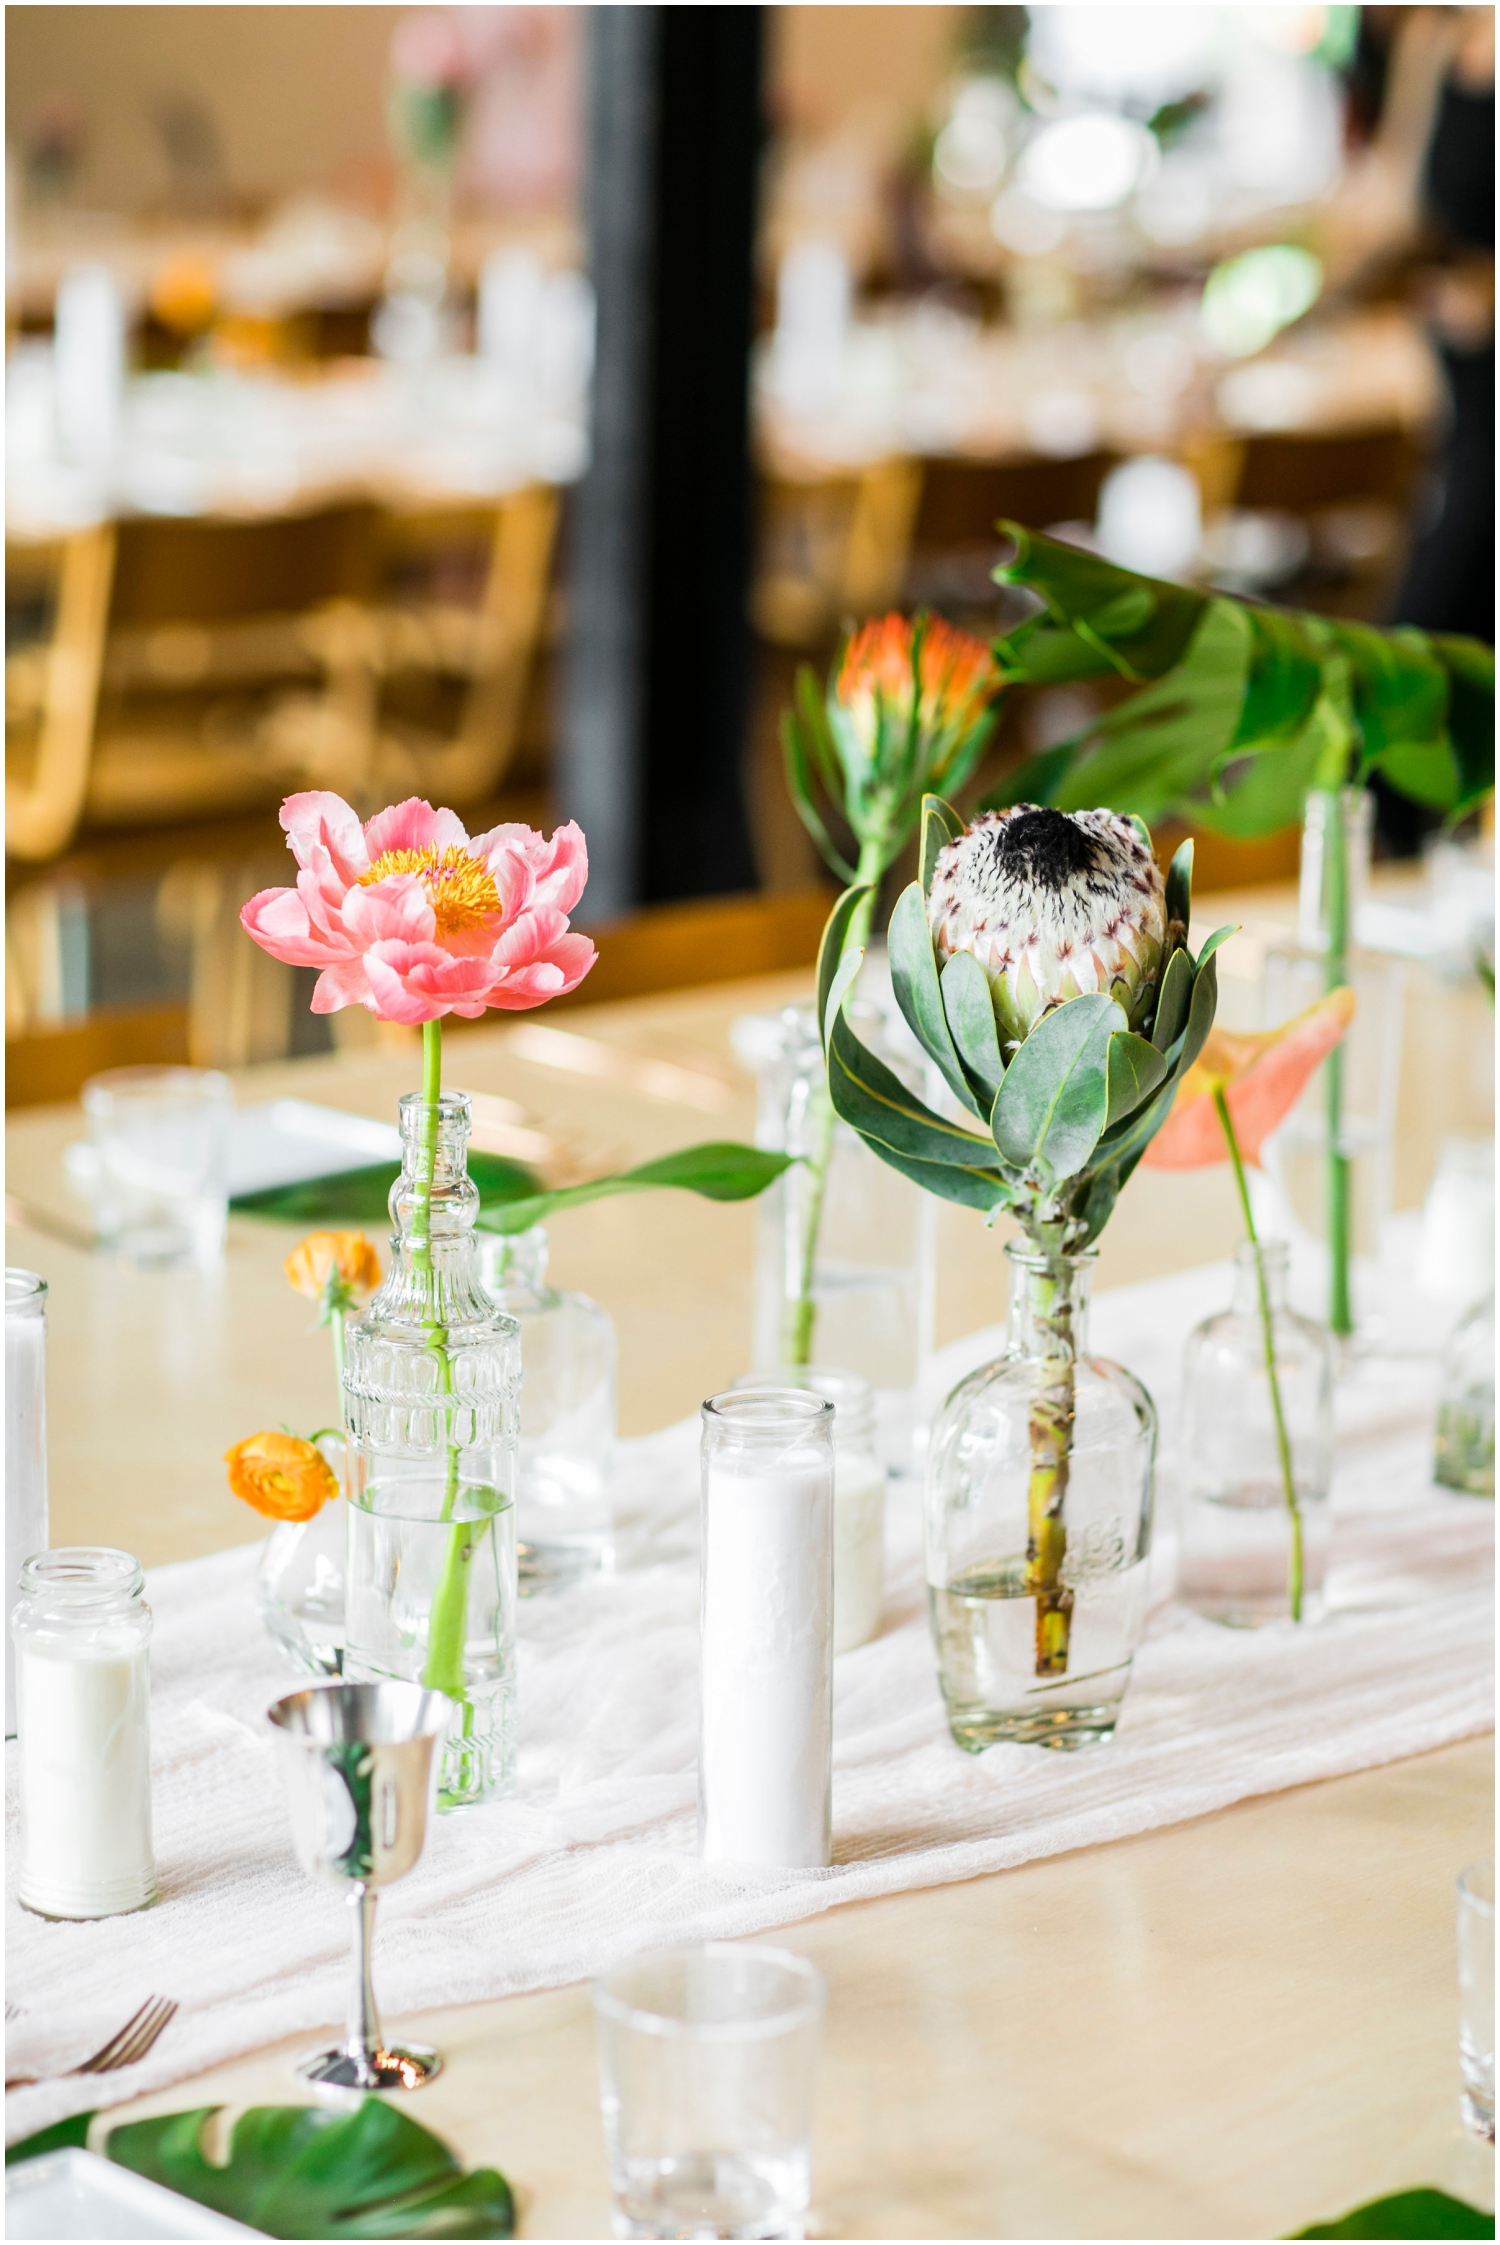 Tropical theme wedding - Paikka- Minnesota Wedding Planner_1468.jpg